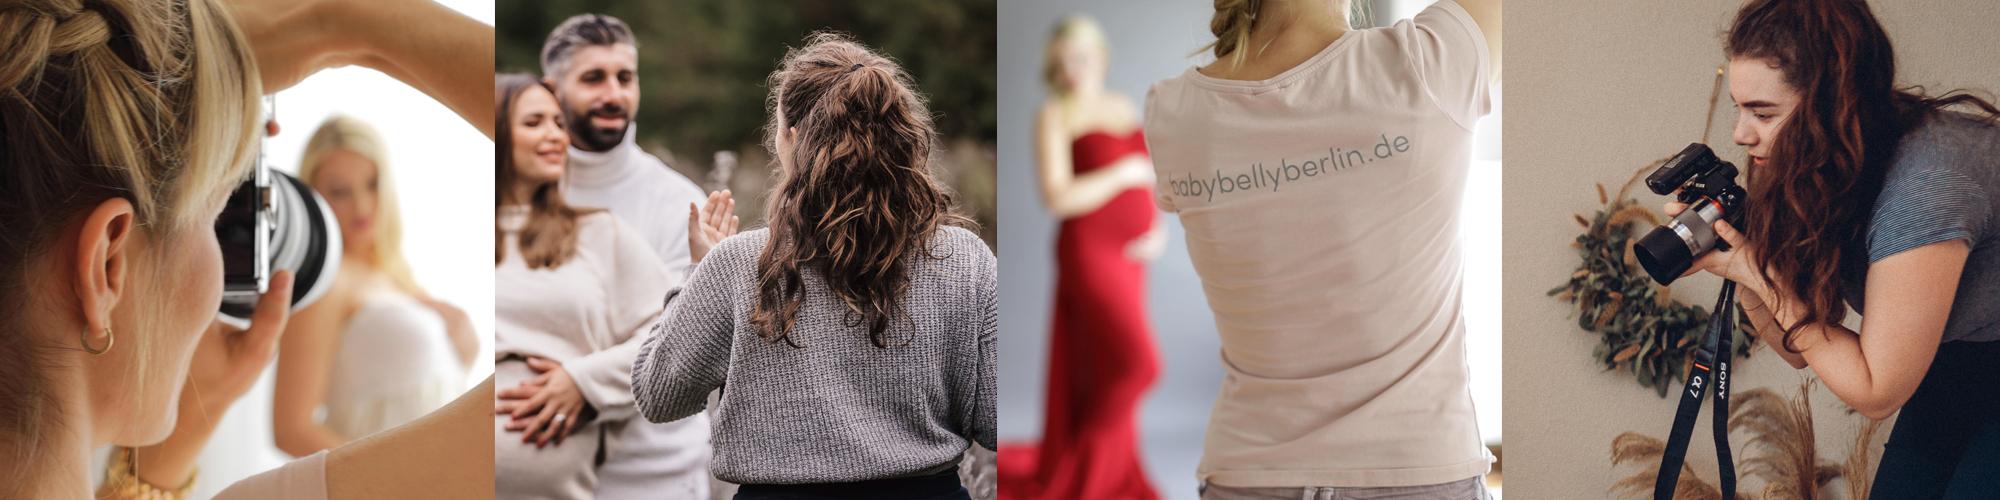 Familien-Fotografin-in-Berlin-Lichtenberg-Norma-Vanessa-Fotostudio-Team